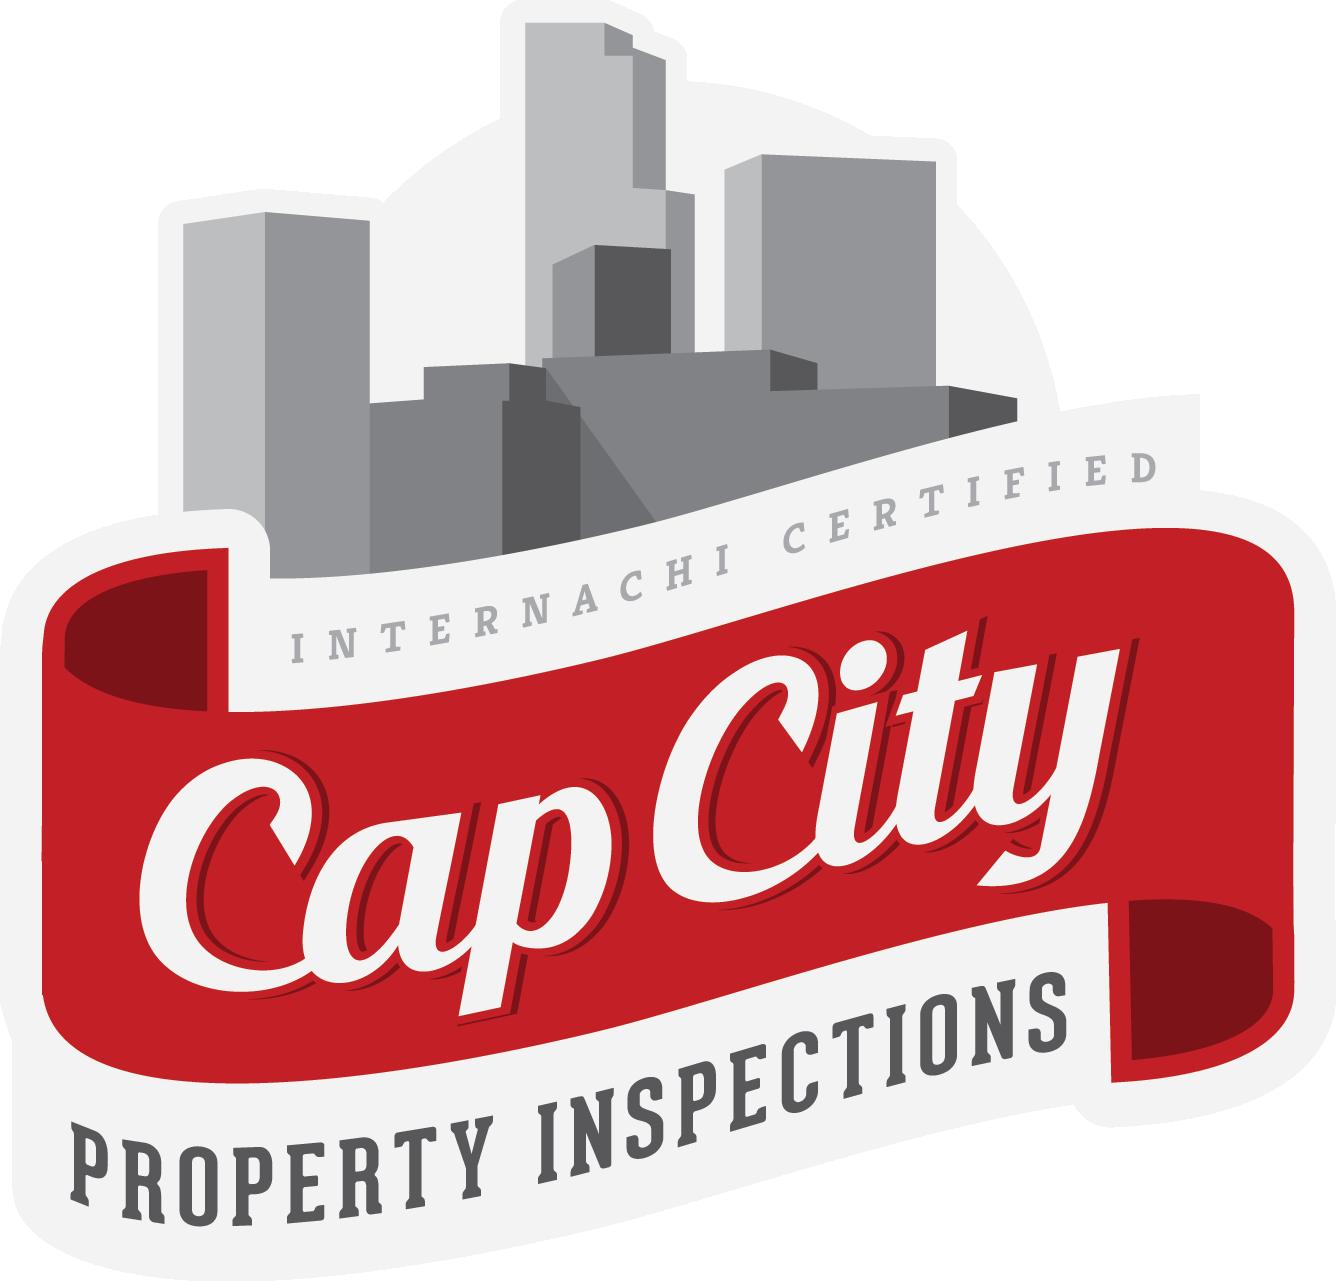 CAP CITY PROPERTY INSPECTIONS - Columbus, OH 43235 - (614)654-6632 | ShowMeLocal.com